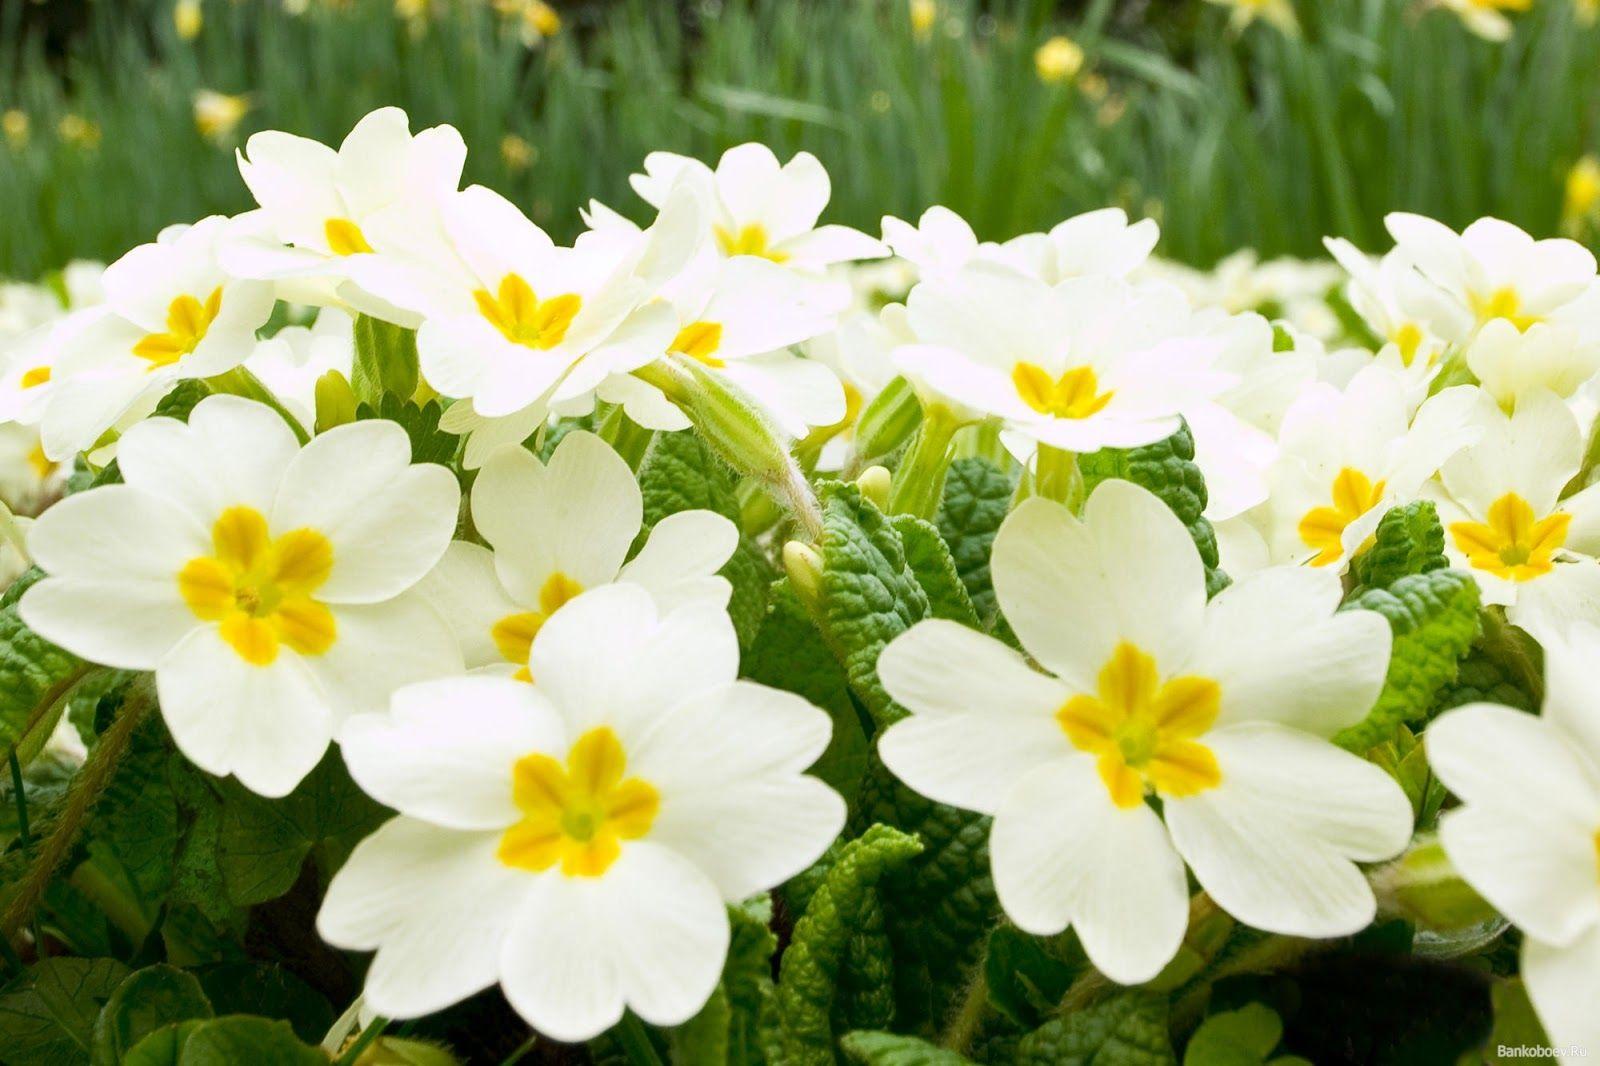 Imagenes De Flores Blancas Hermosas Para Computadora Colage Cuadro